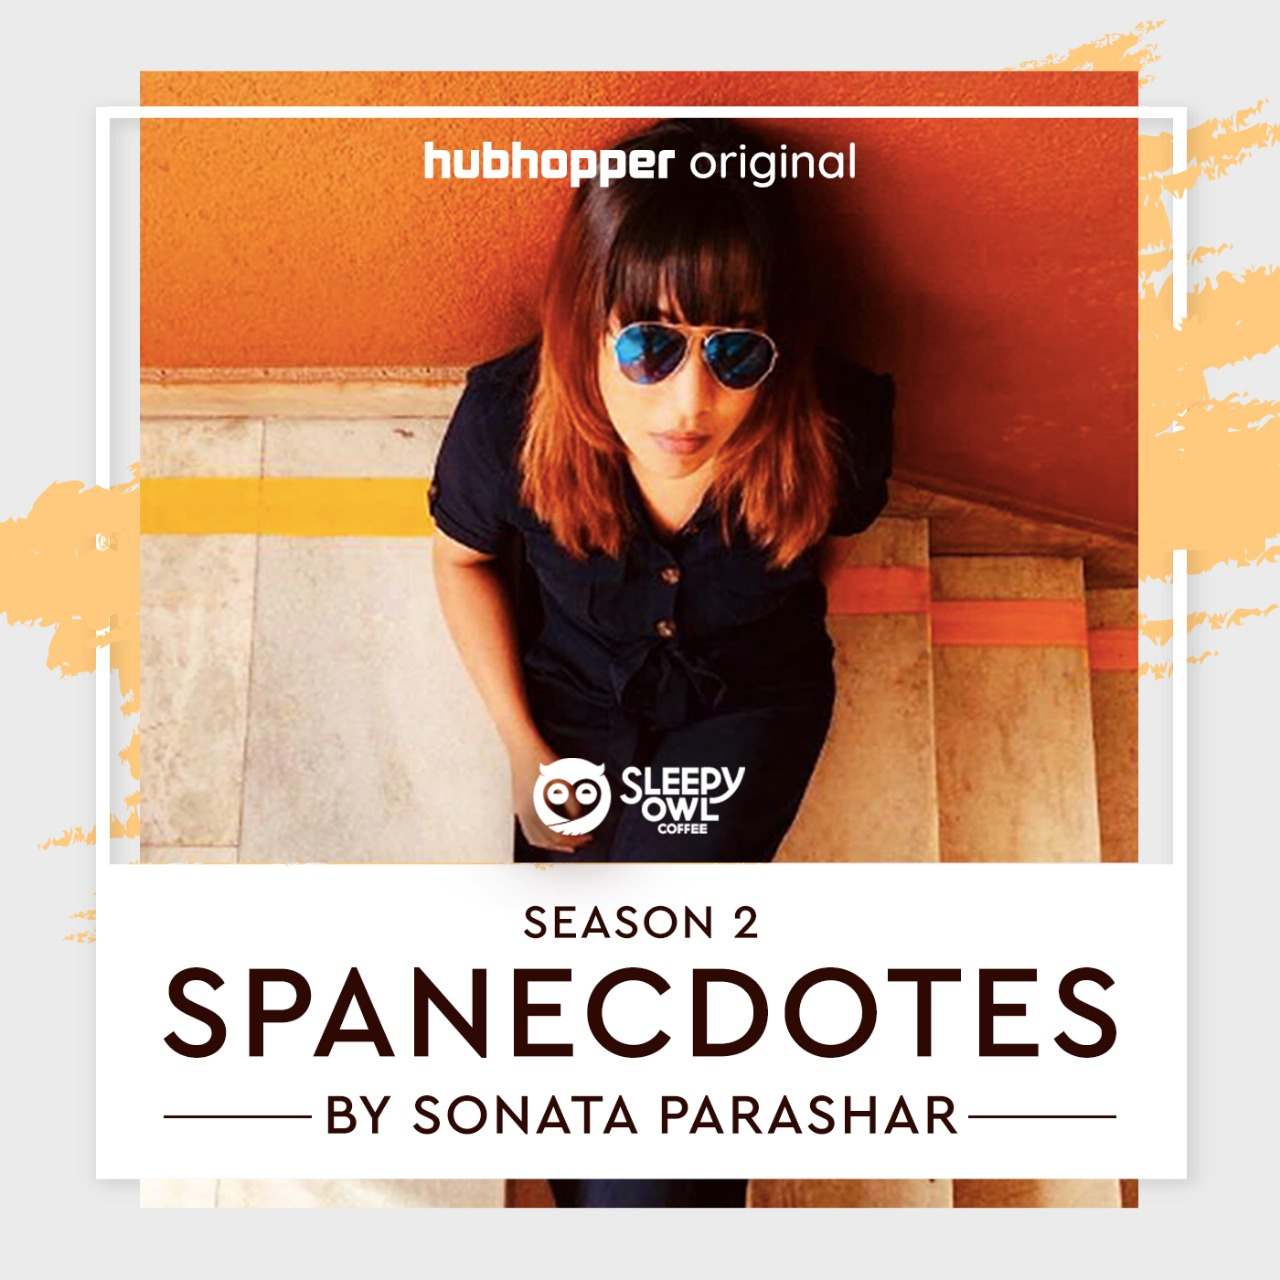 Spanecdotes by Sonata